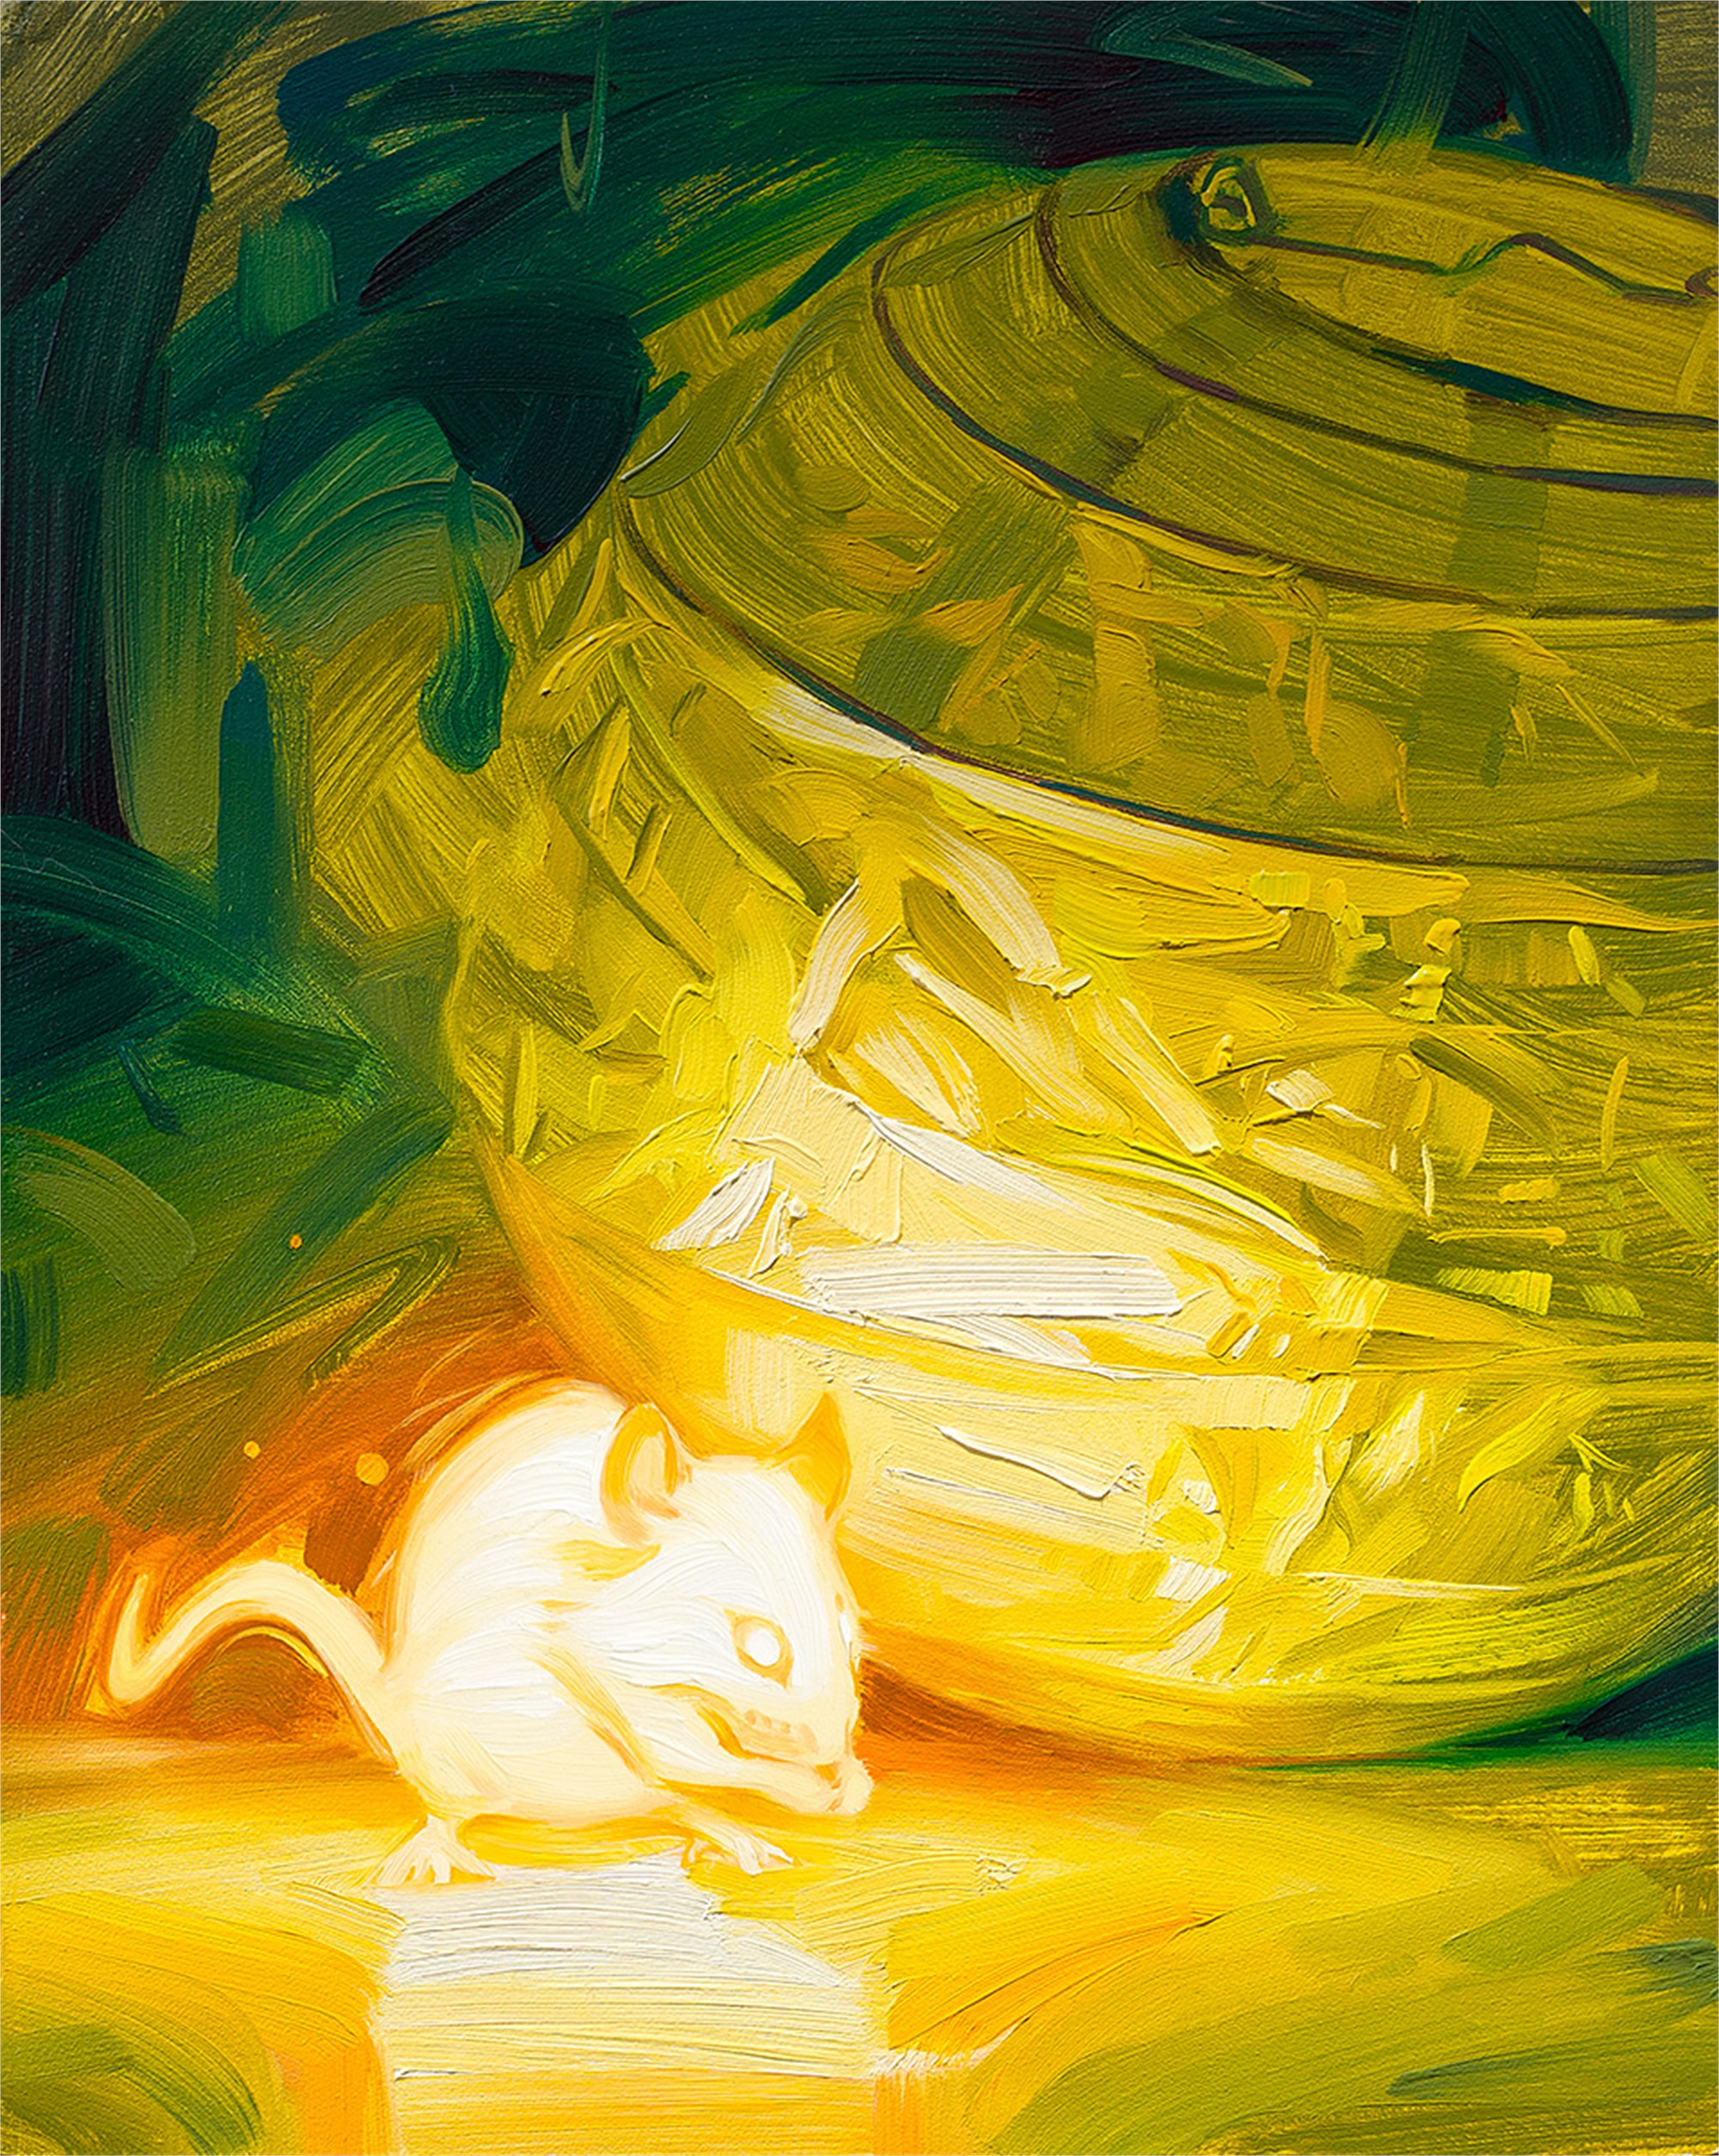 Bioluminescence 1 by Rob Rey